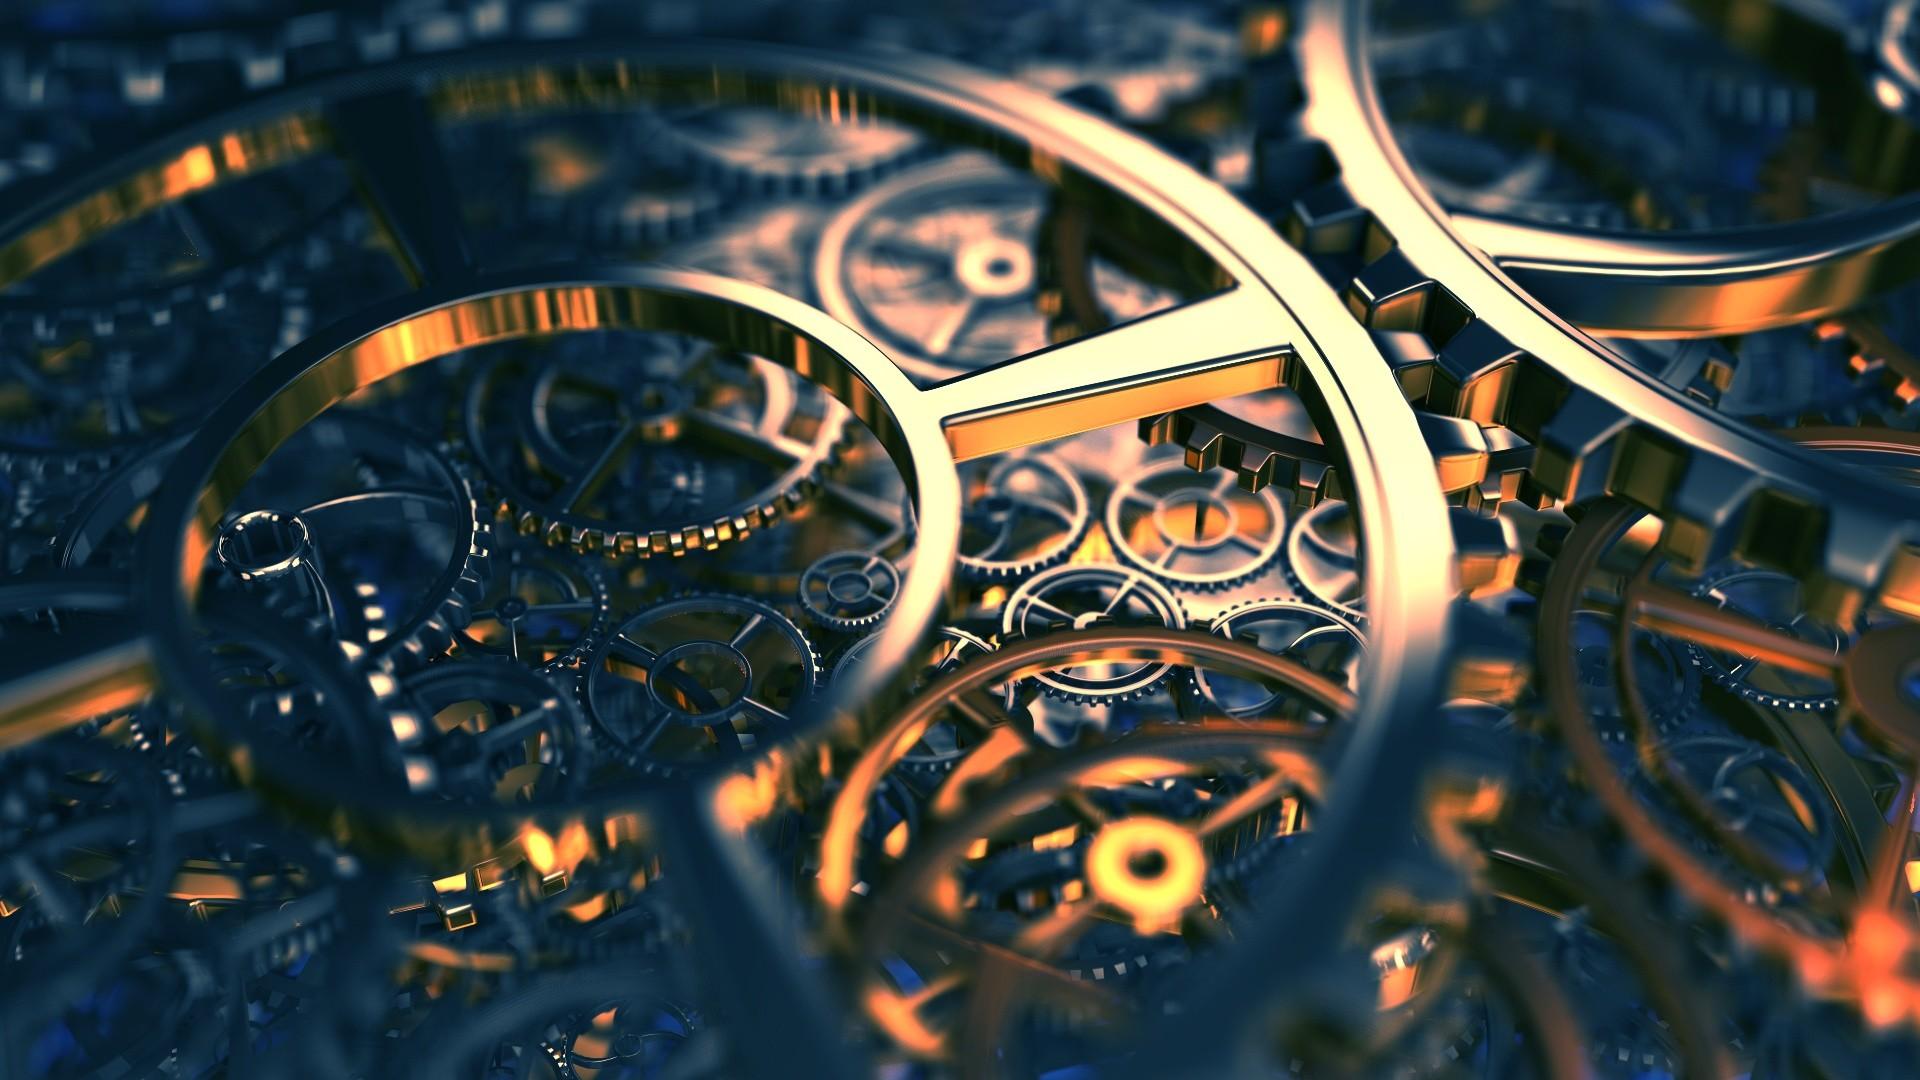 steampunk-wallpaper-hd-1630-1769-hd-wallpapers.jpg